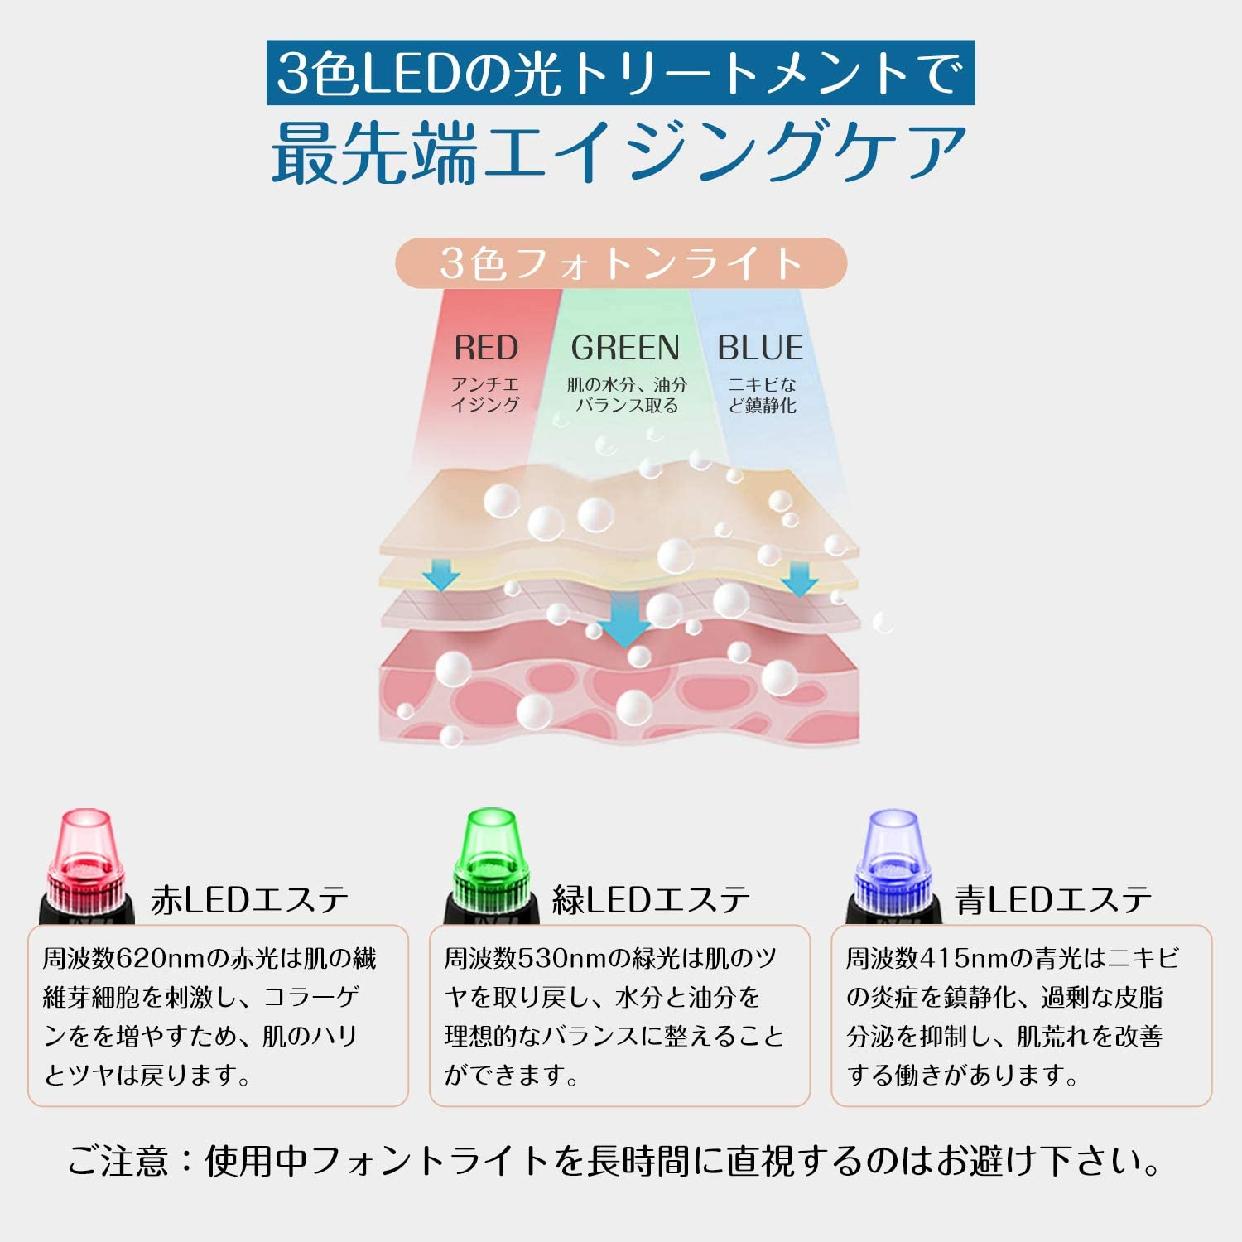 kiboer(-)毛穴吸引器 毛穴クリーンの商品画像4